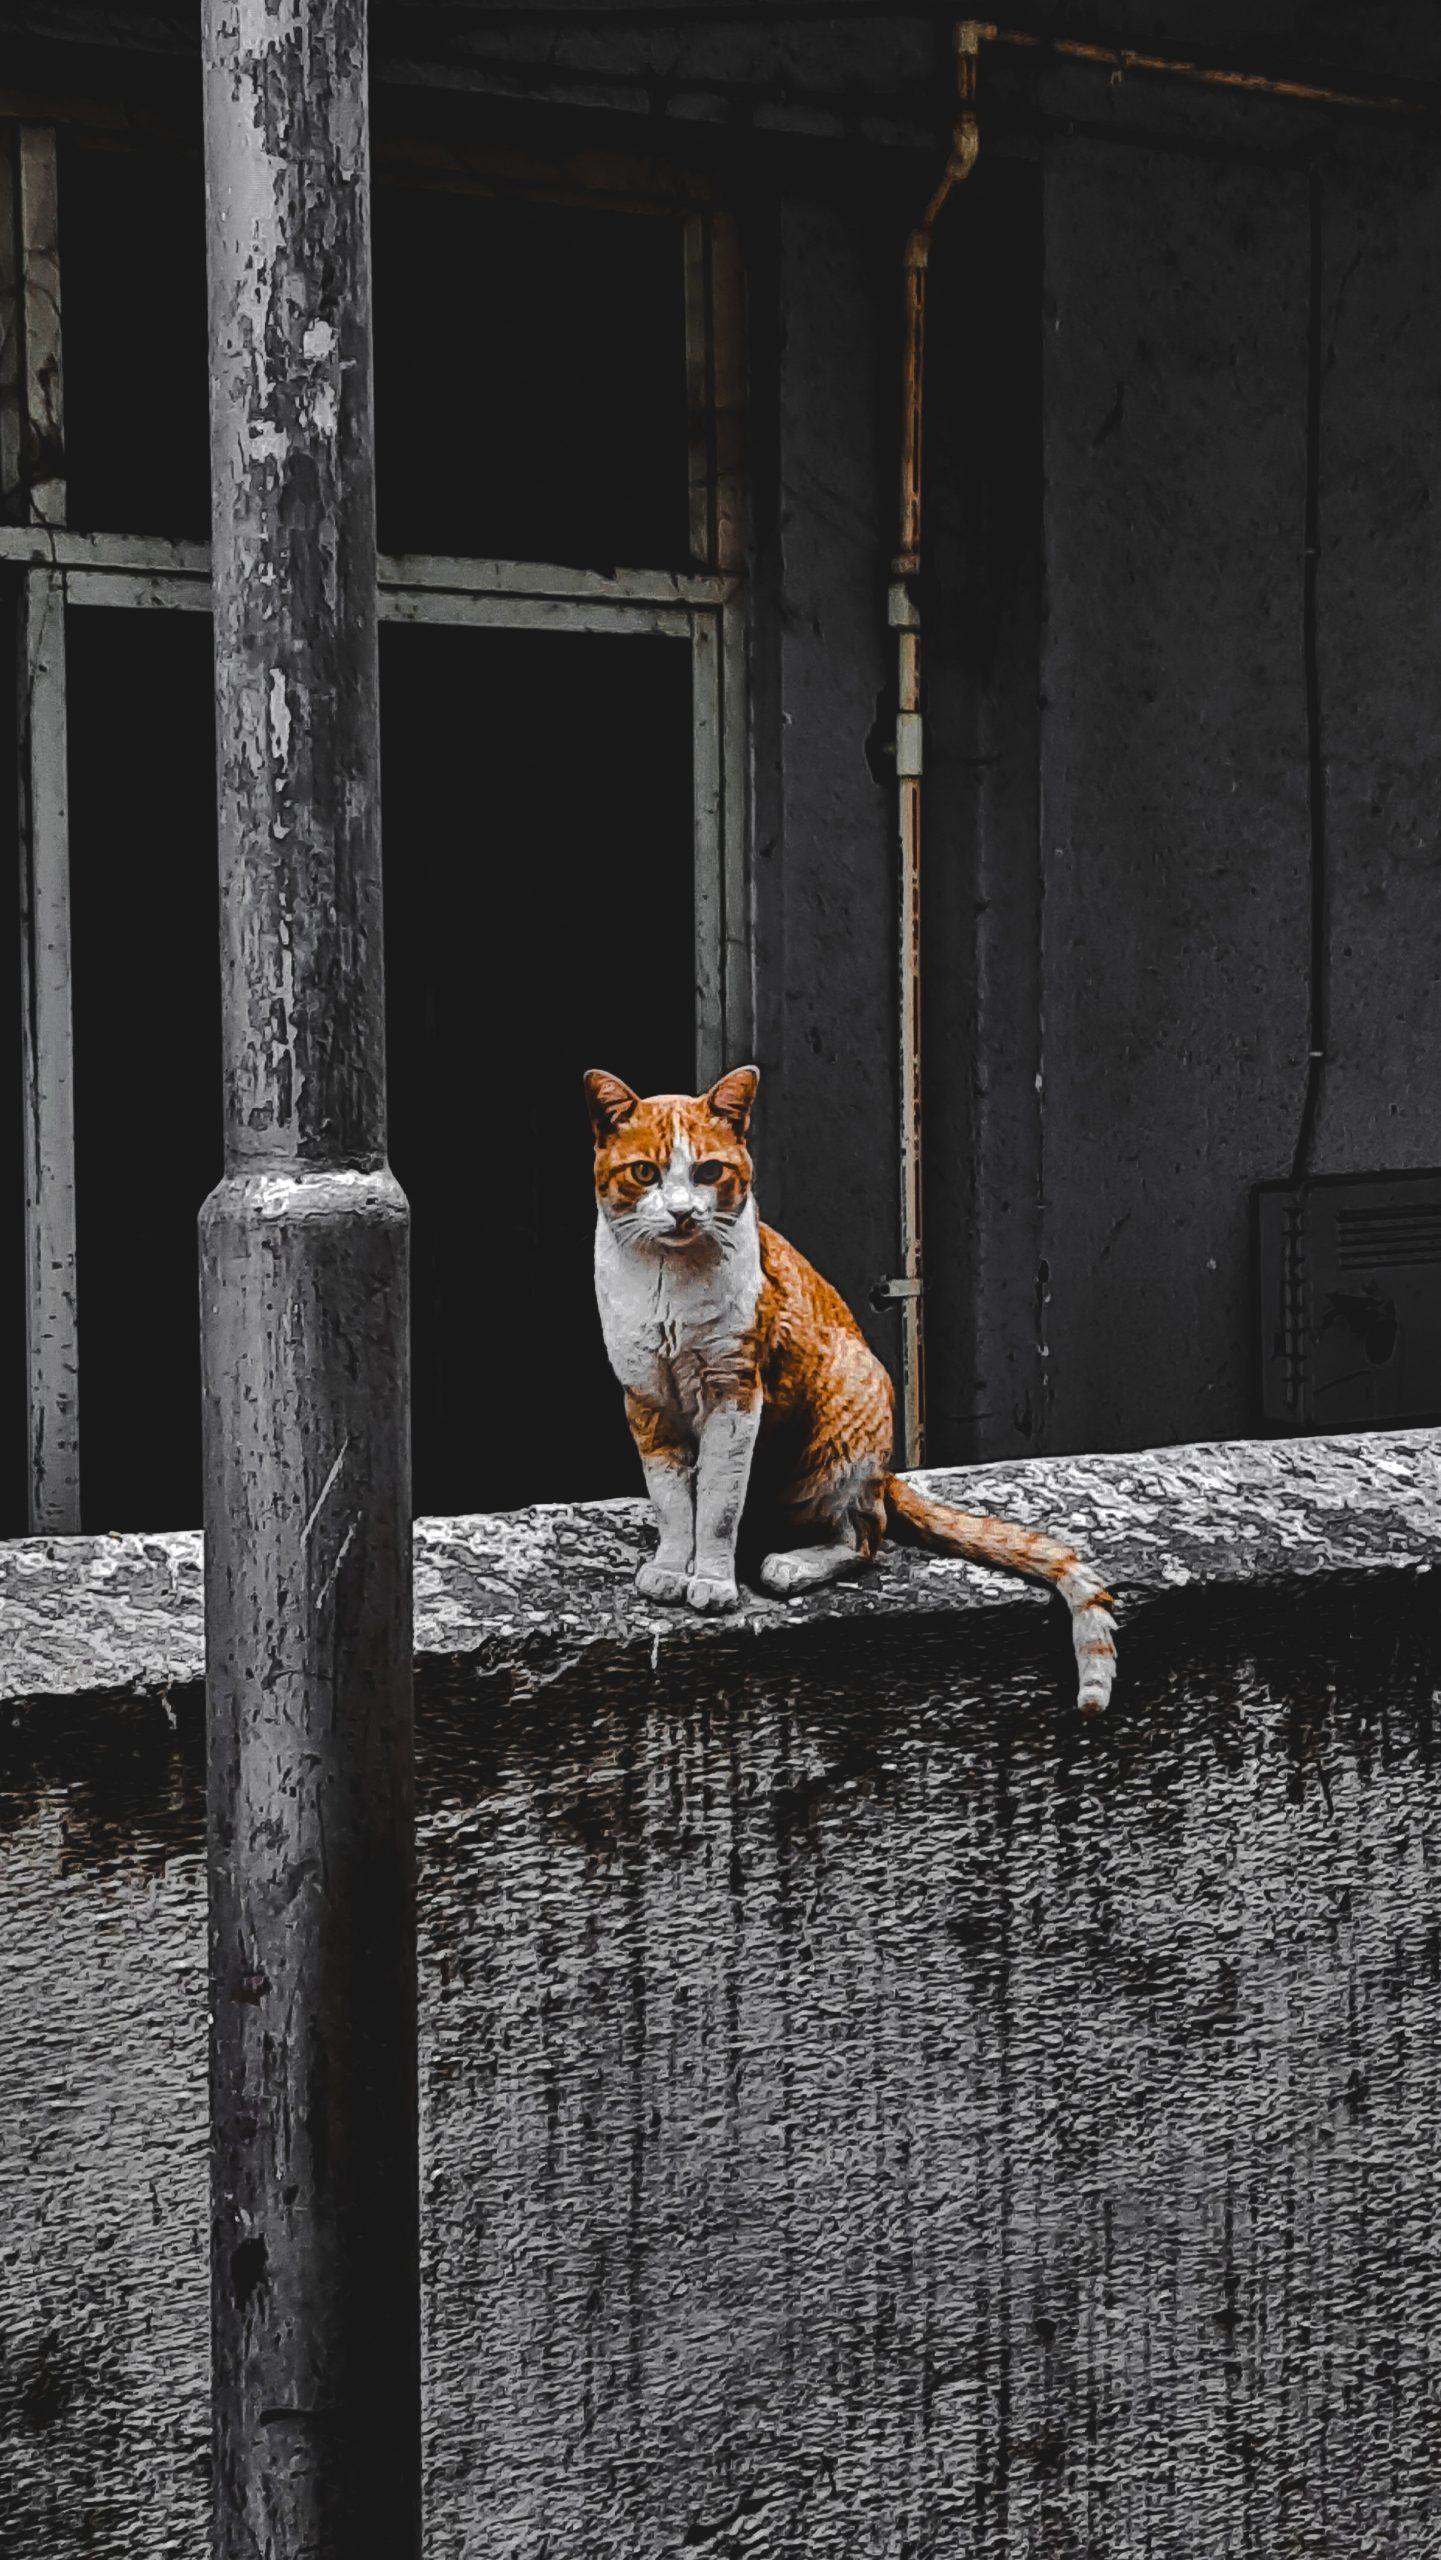 Cat sitting on wall